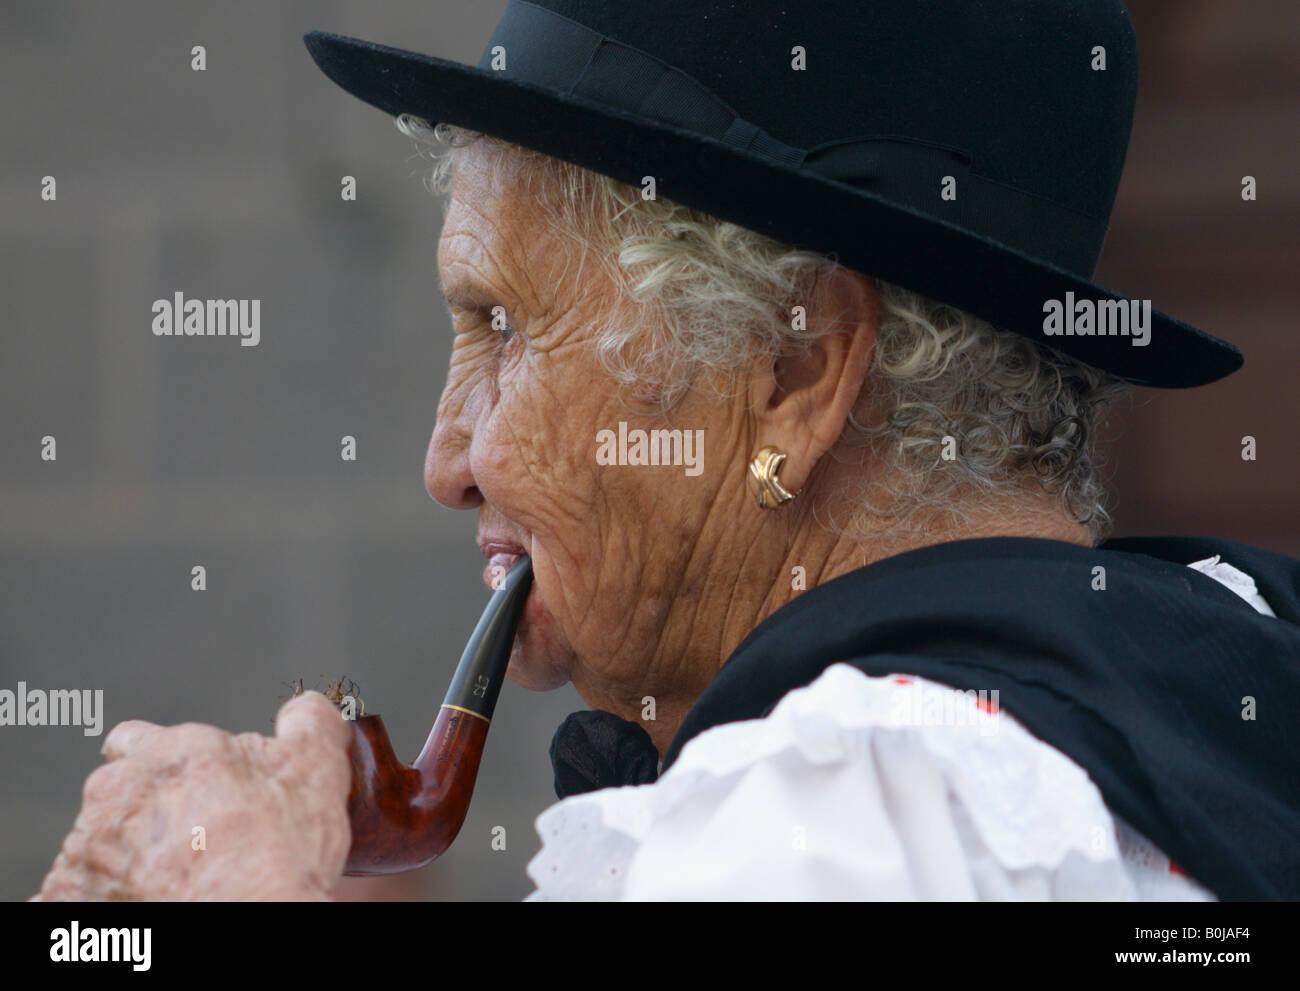 Vieille dame pipes